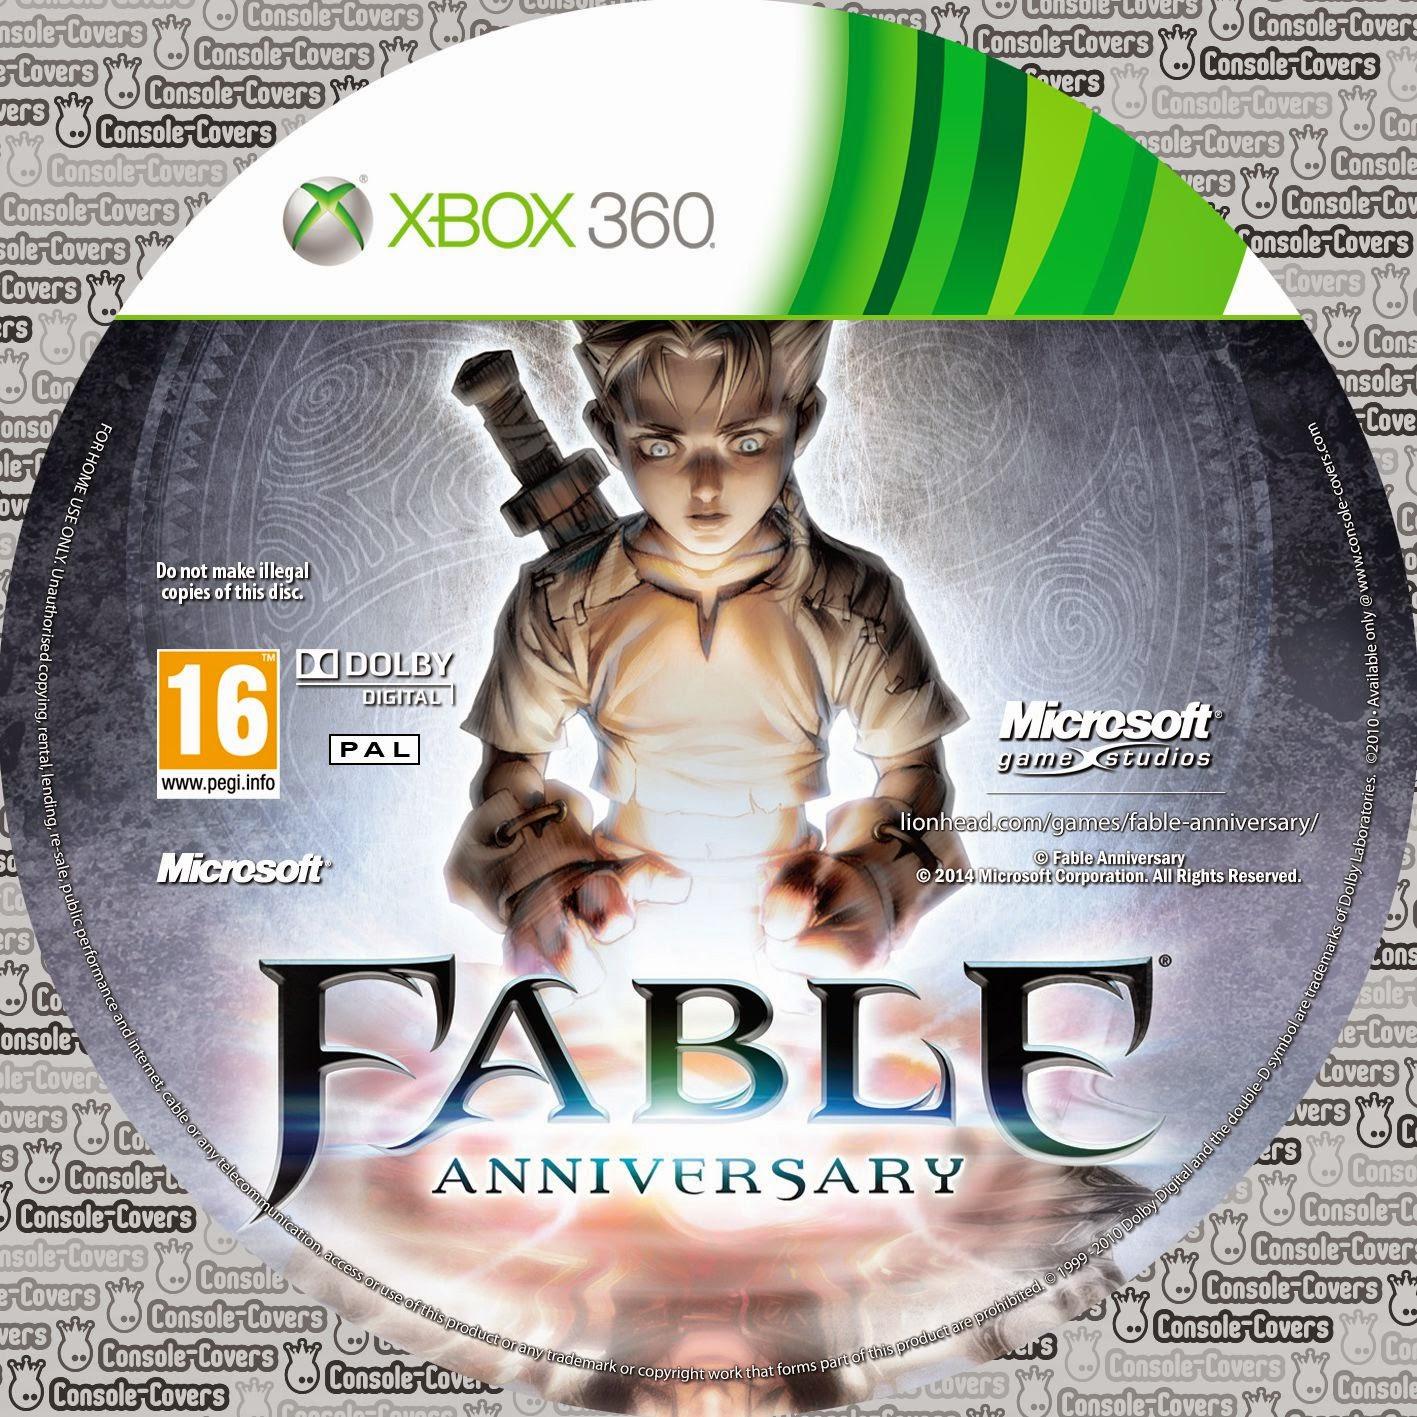 Label Fable Anniversary Xbox 360